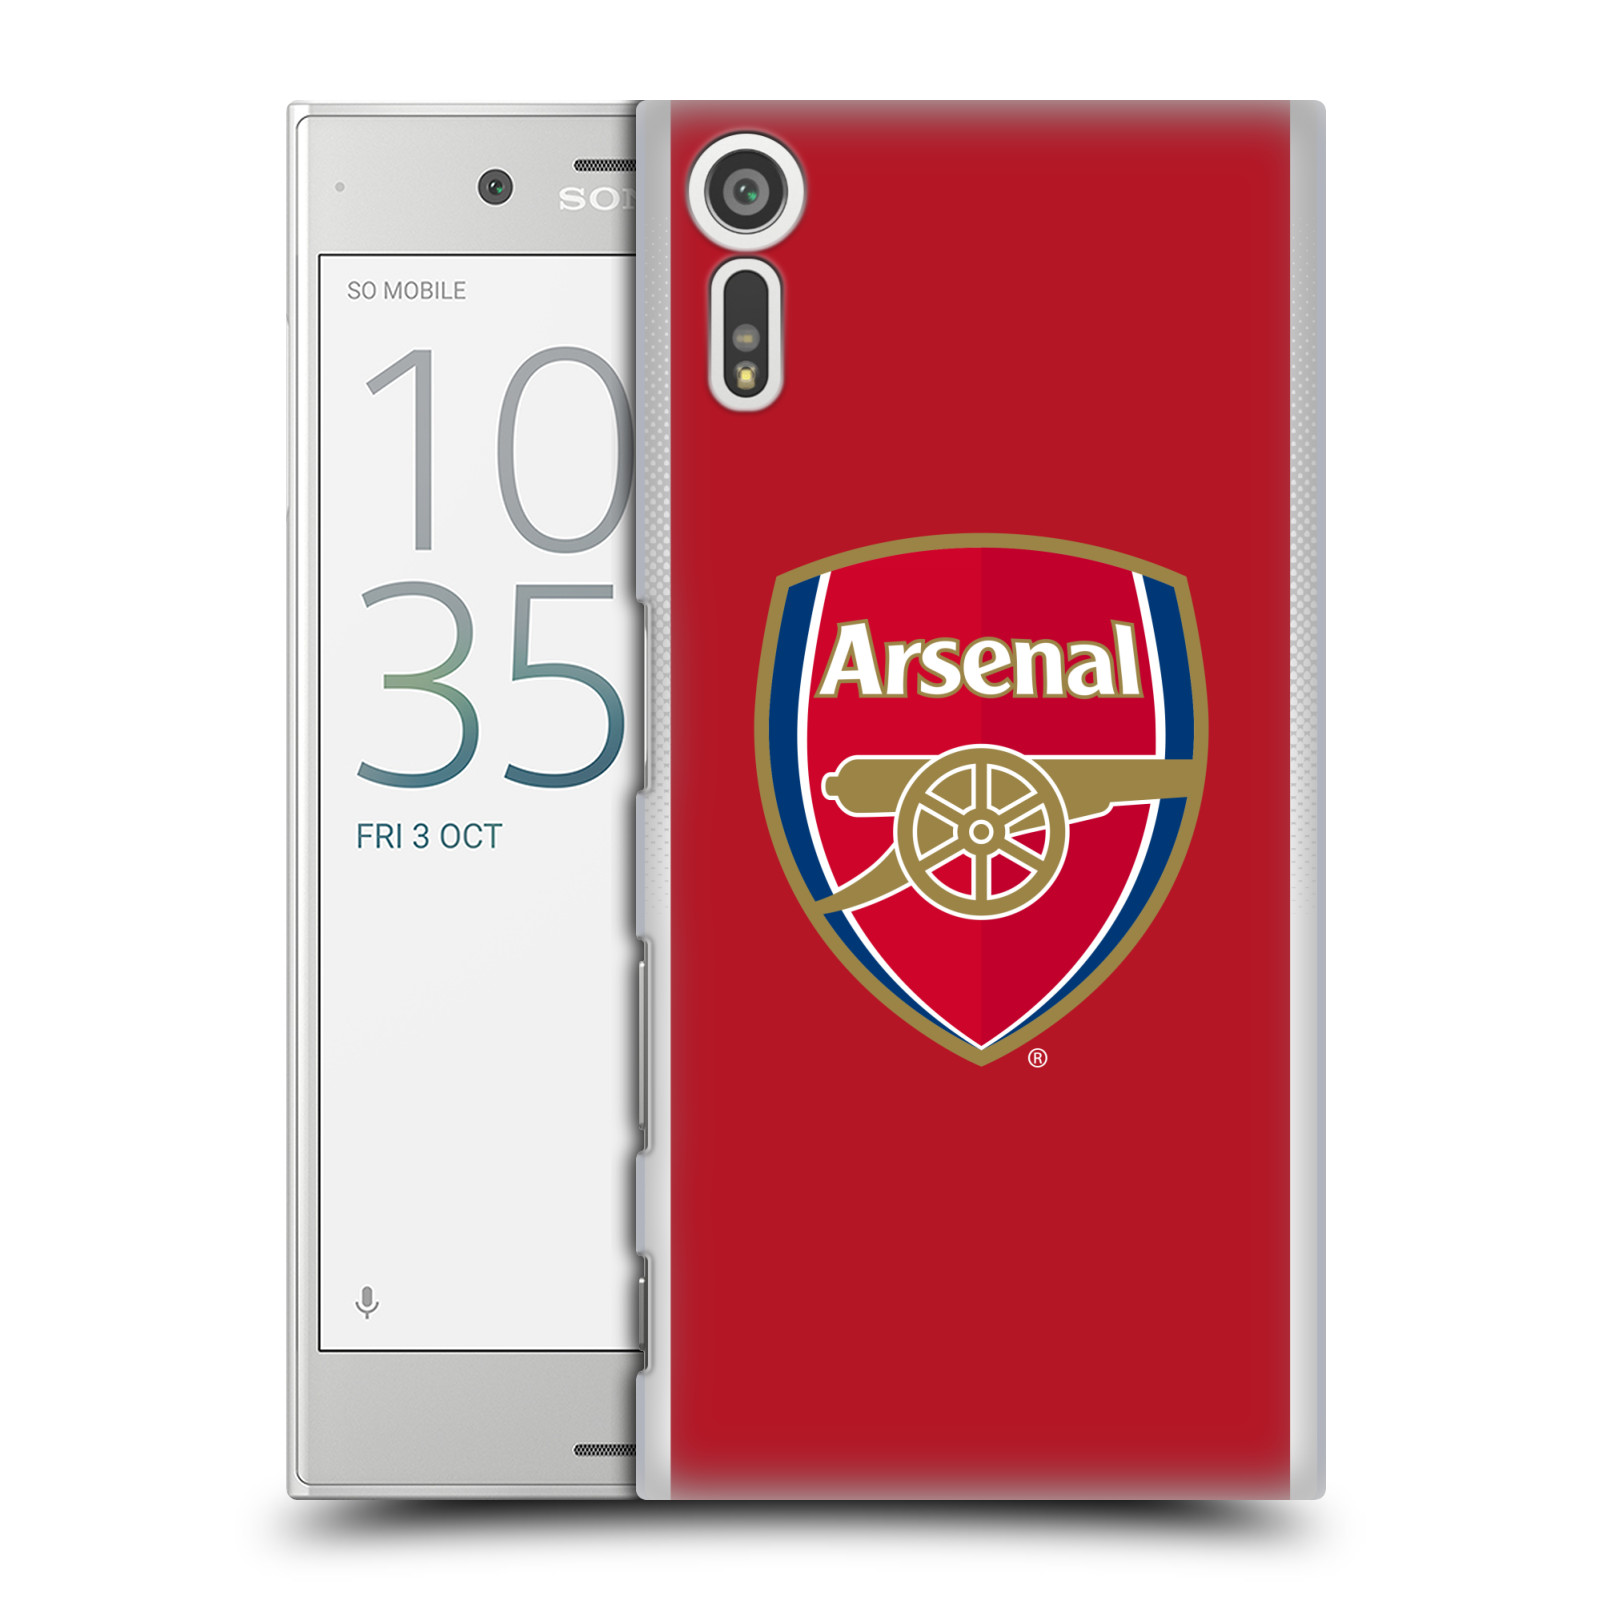 Plastové pouzdro na mobil Sony Xperia XZ - Head Case - Arsenal FC - Logo klubu